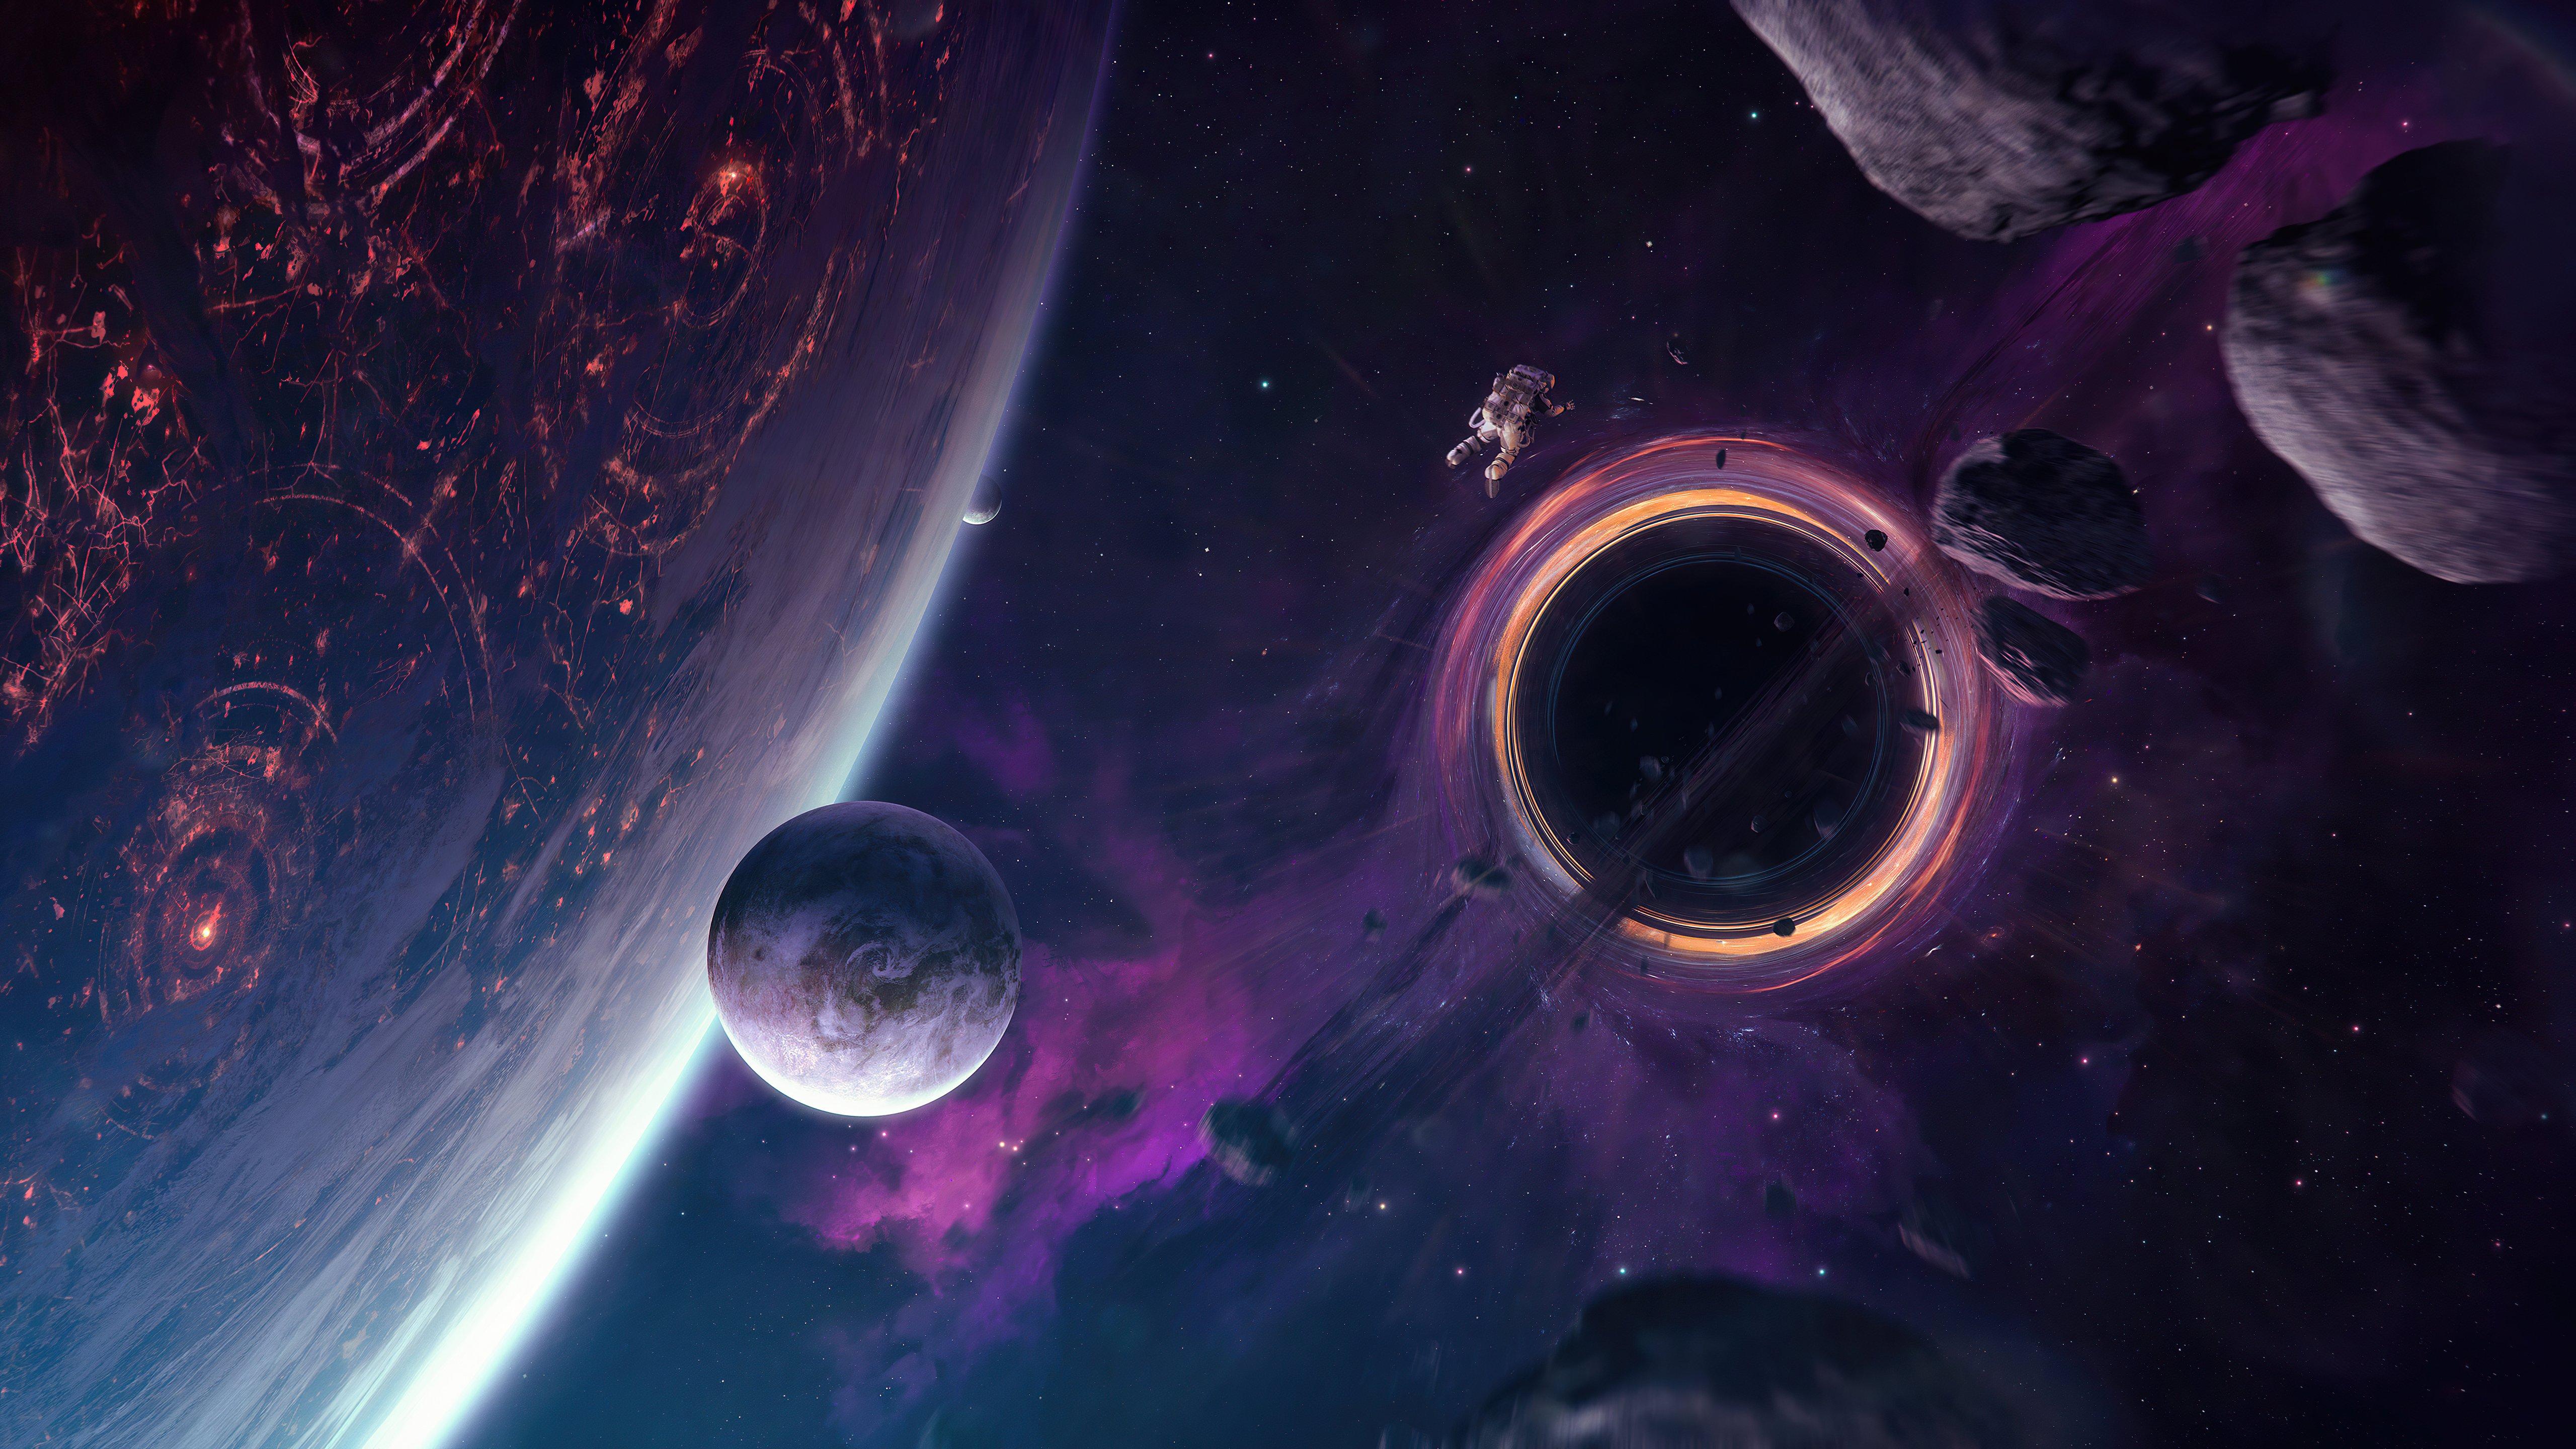 Fondos de pantalla Hoyo negro alrededor de asteroides y planetas